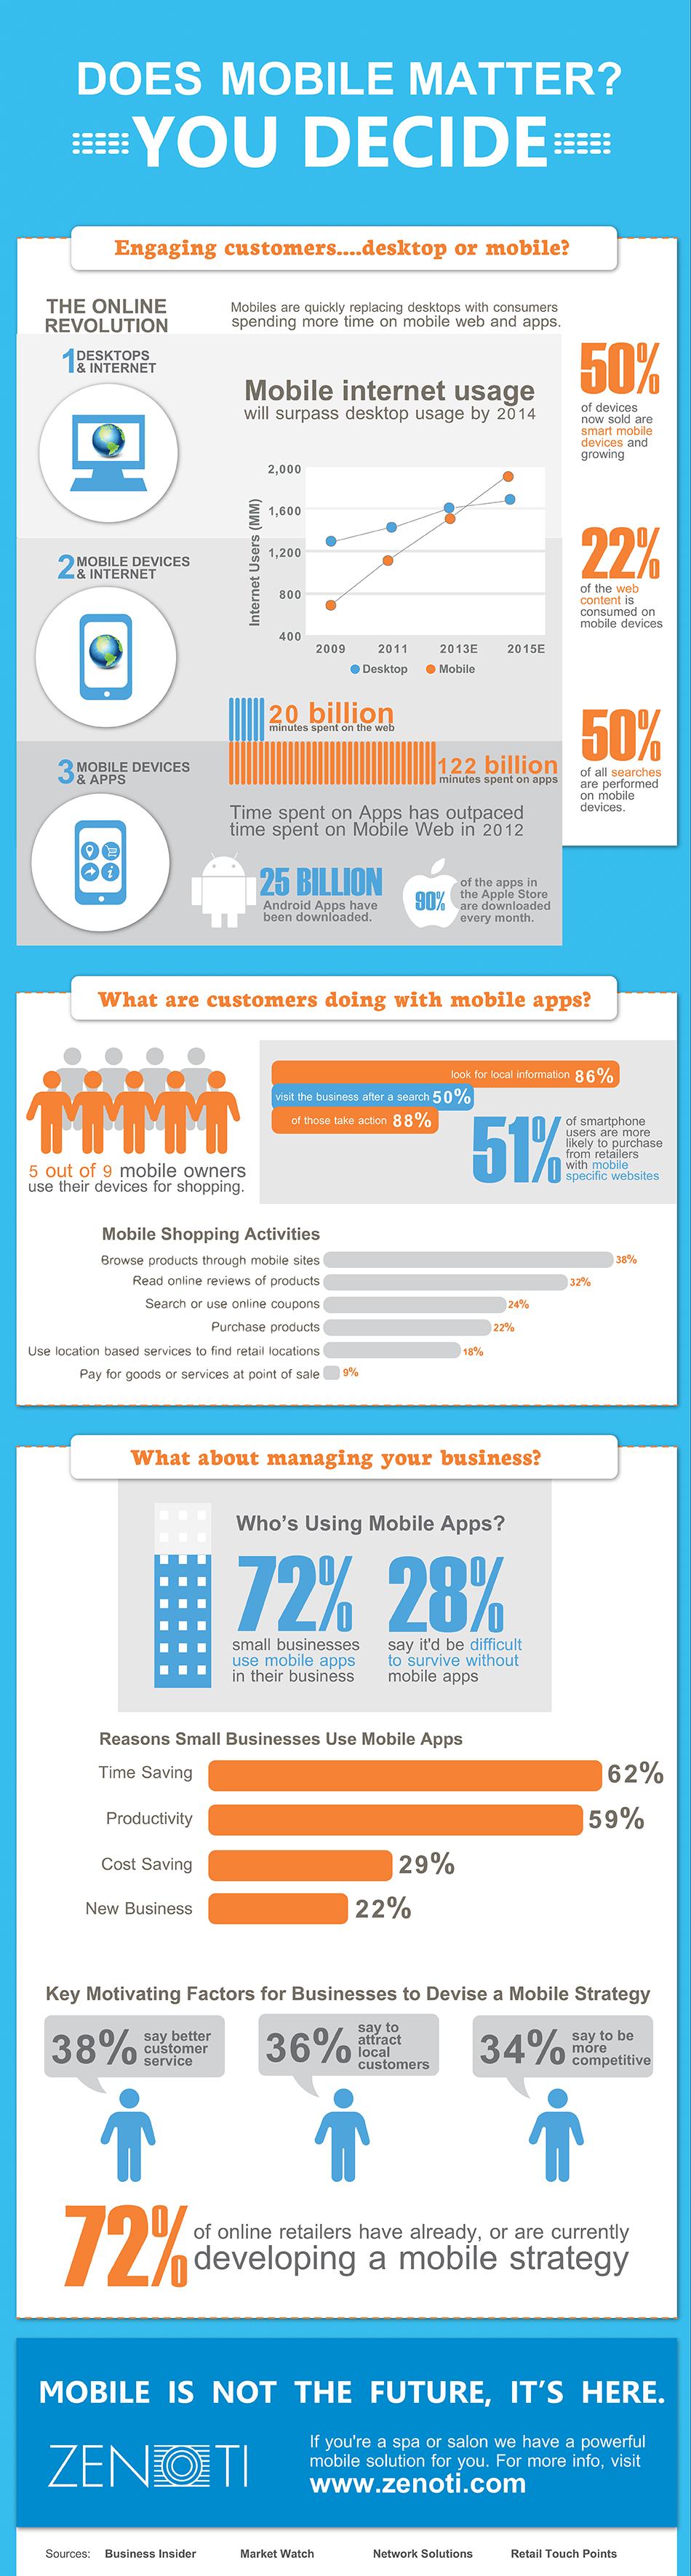 Engaging Customer Mobile or Desktop